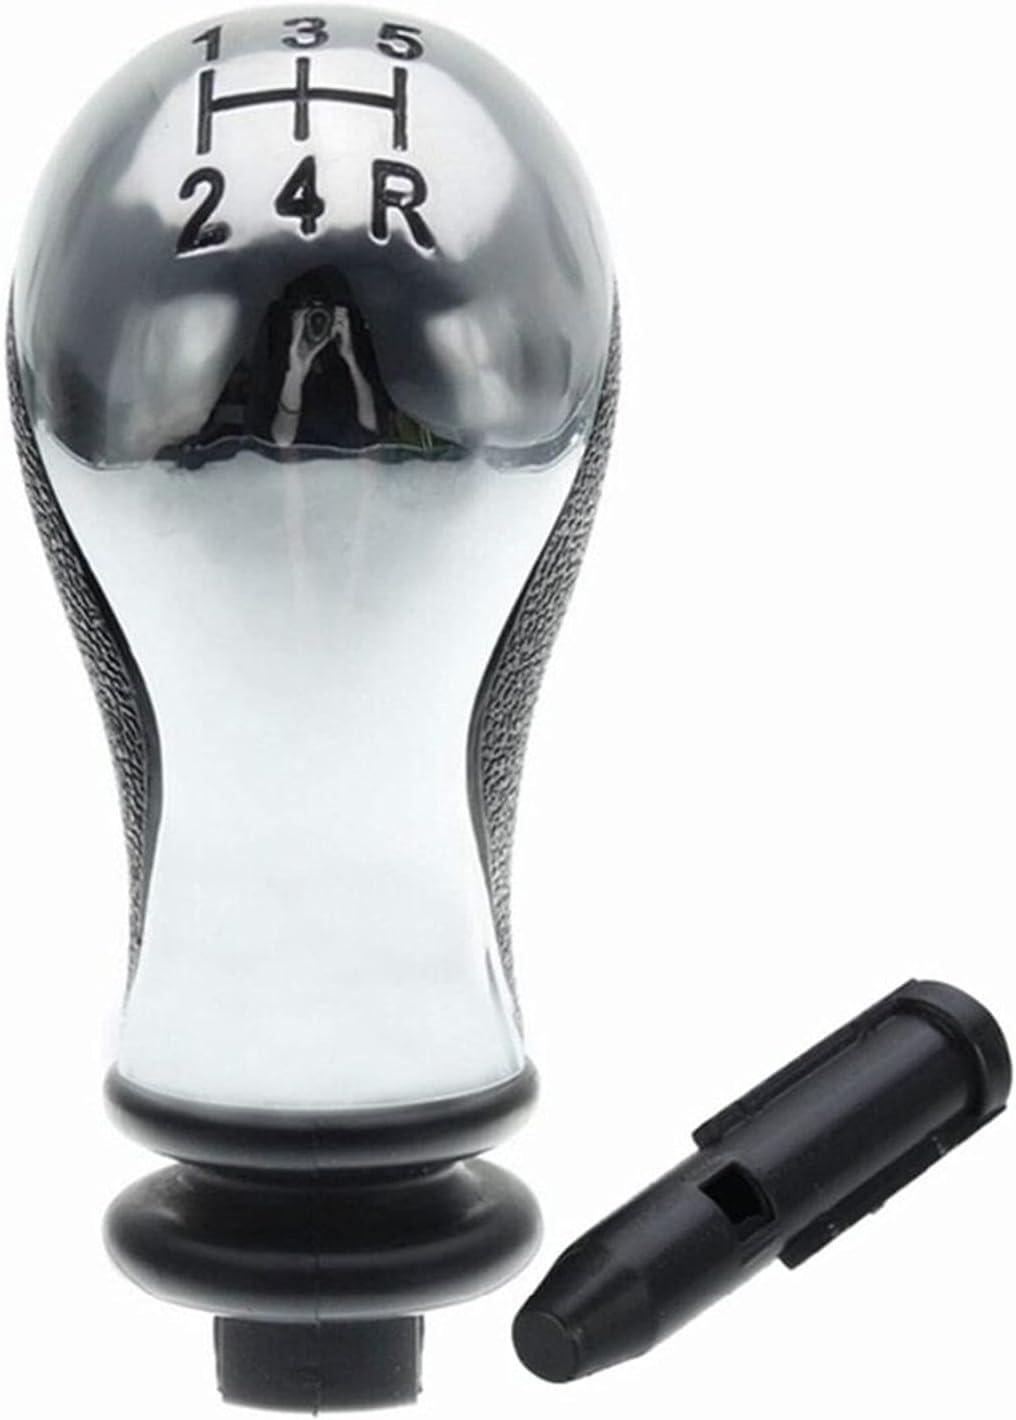 IJEOKDHDUW 5-Speed Miami Mall Gear Cheap super special price Shift Knob Stick Compatible C with Lever